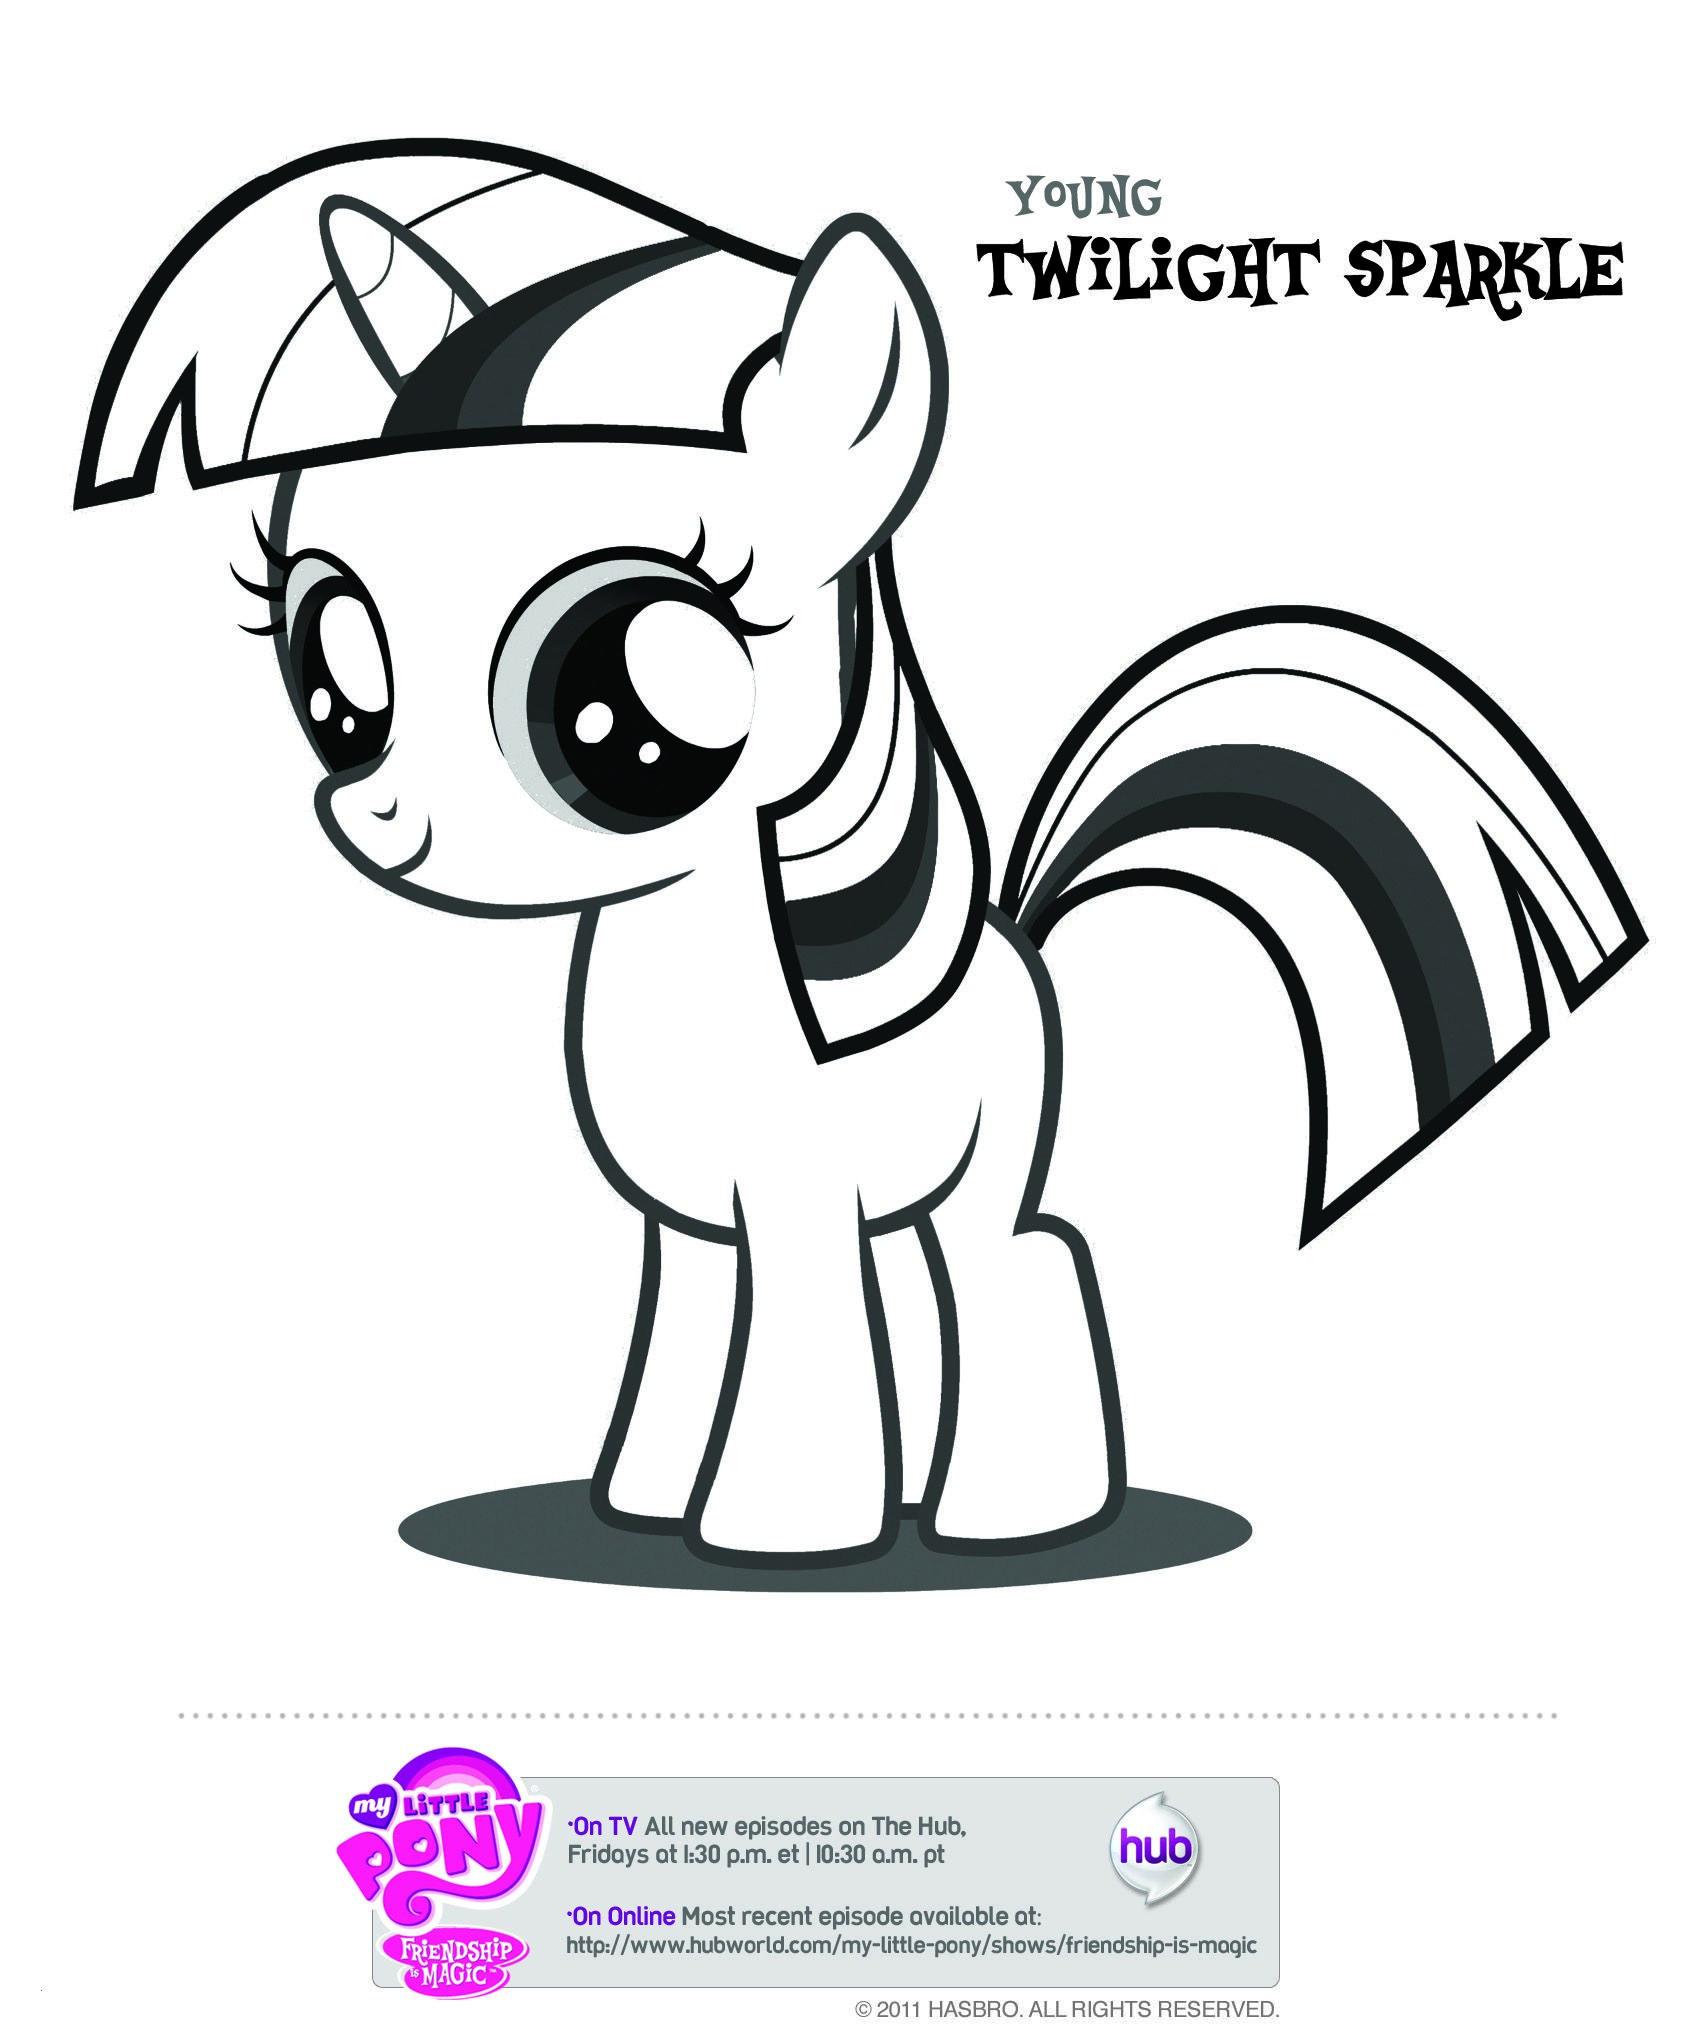 Ausmalbilder Little Pony Neu 40 My Little Pony Friendship is Magic Ausmalbilder Scoredatscore Bilder